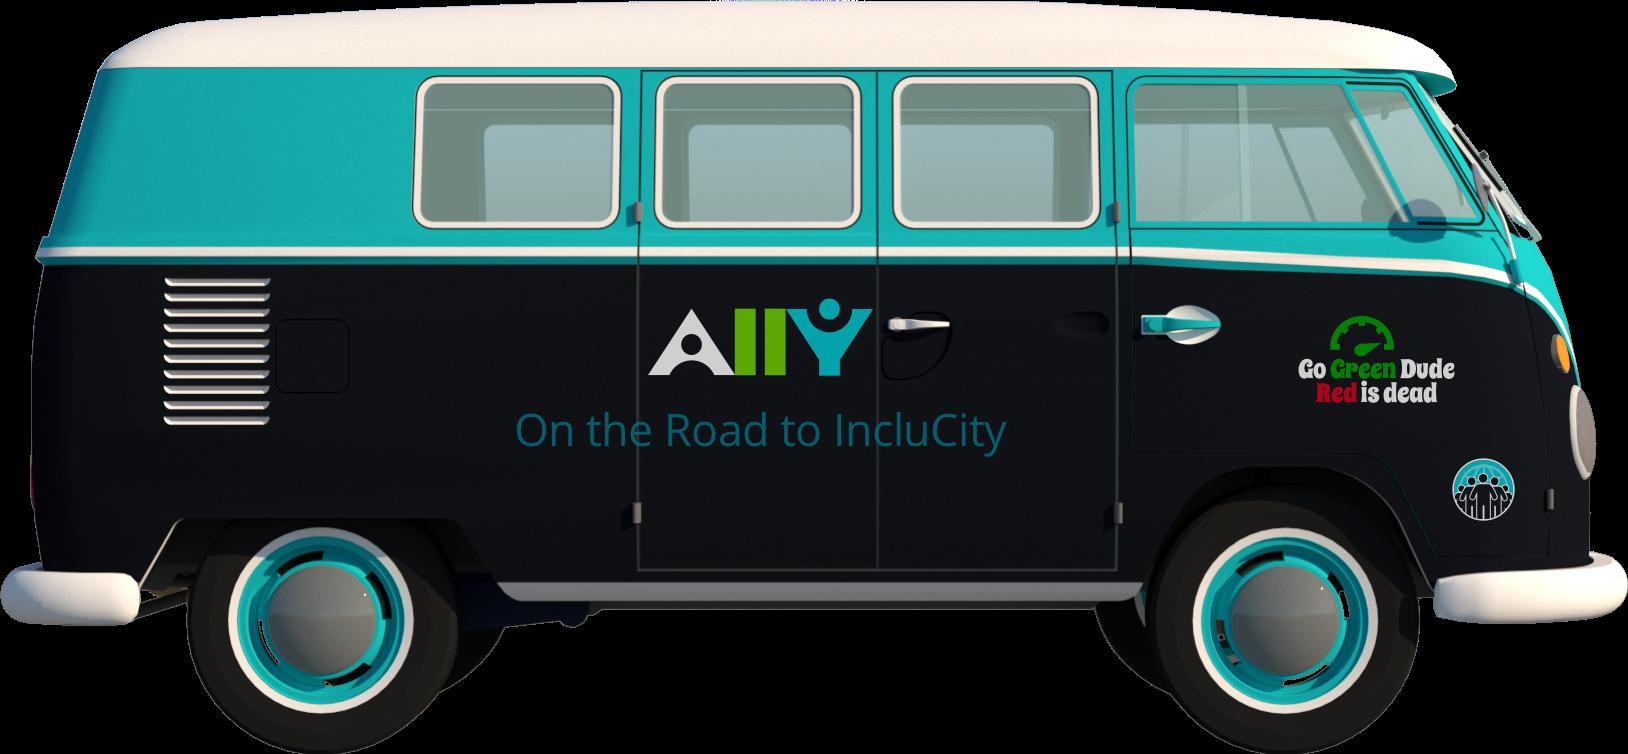 Ally bus